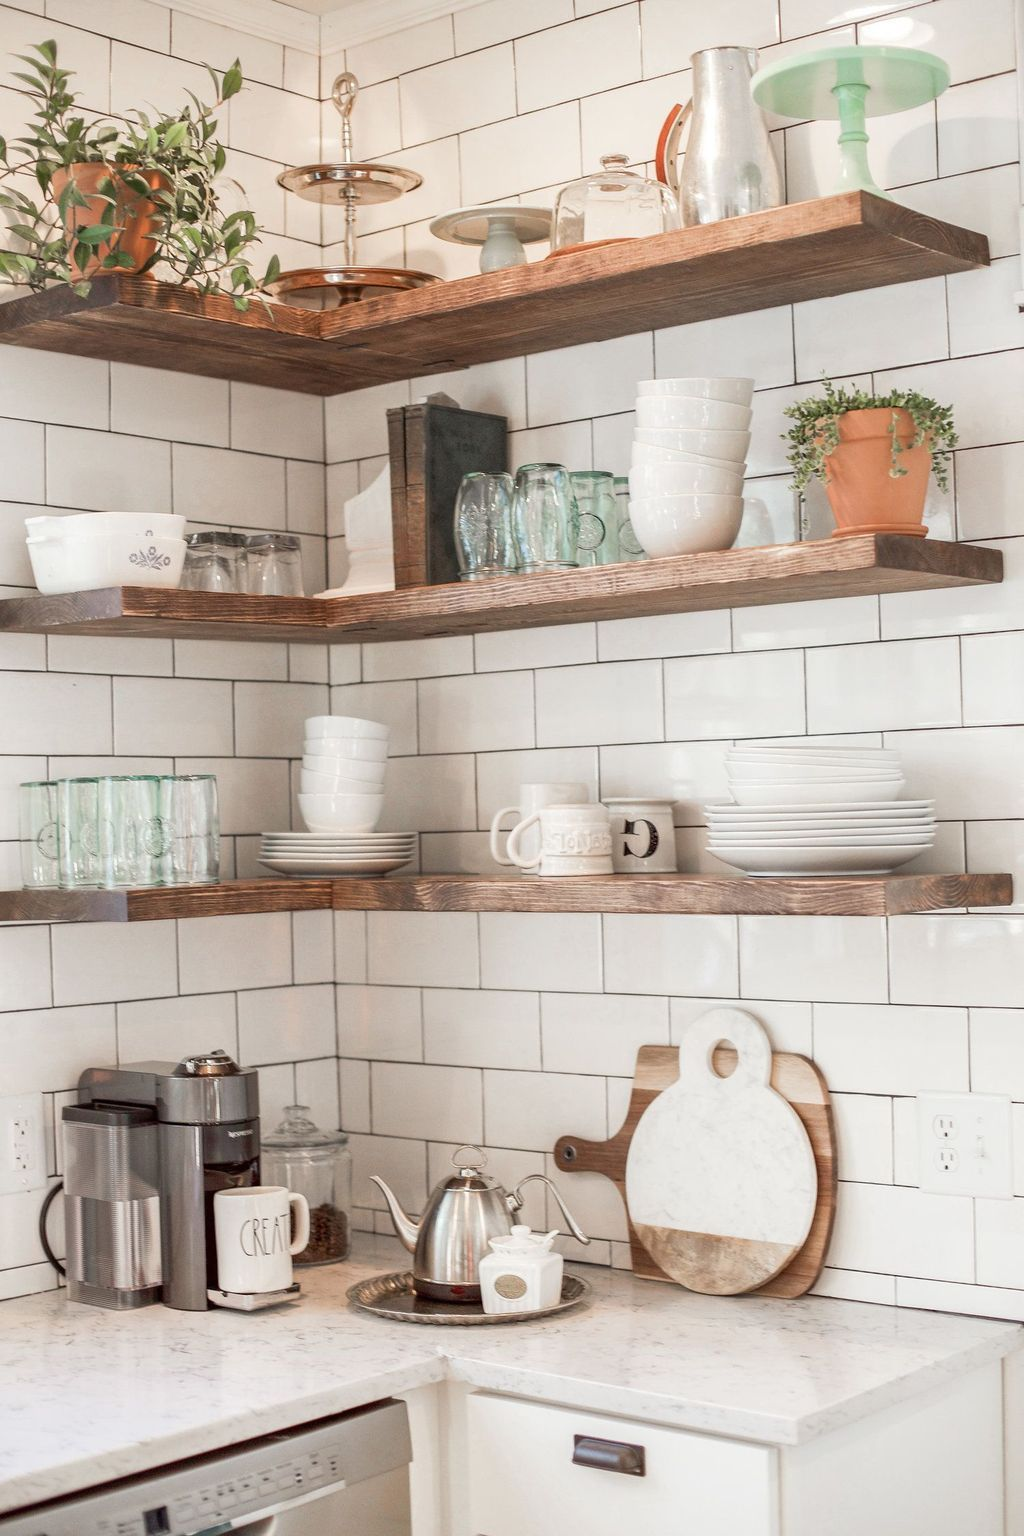 Ideas for kitchen decor   Totally Inspiring Beach Kitchen Decor Ideas  Kitchen Design